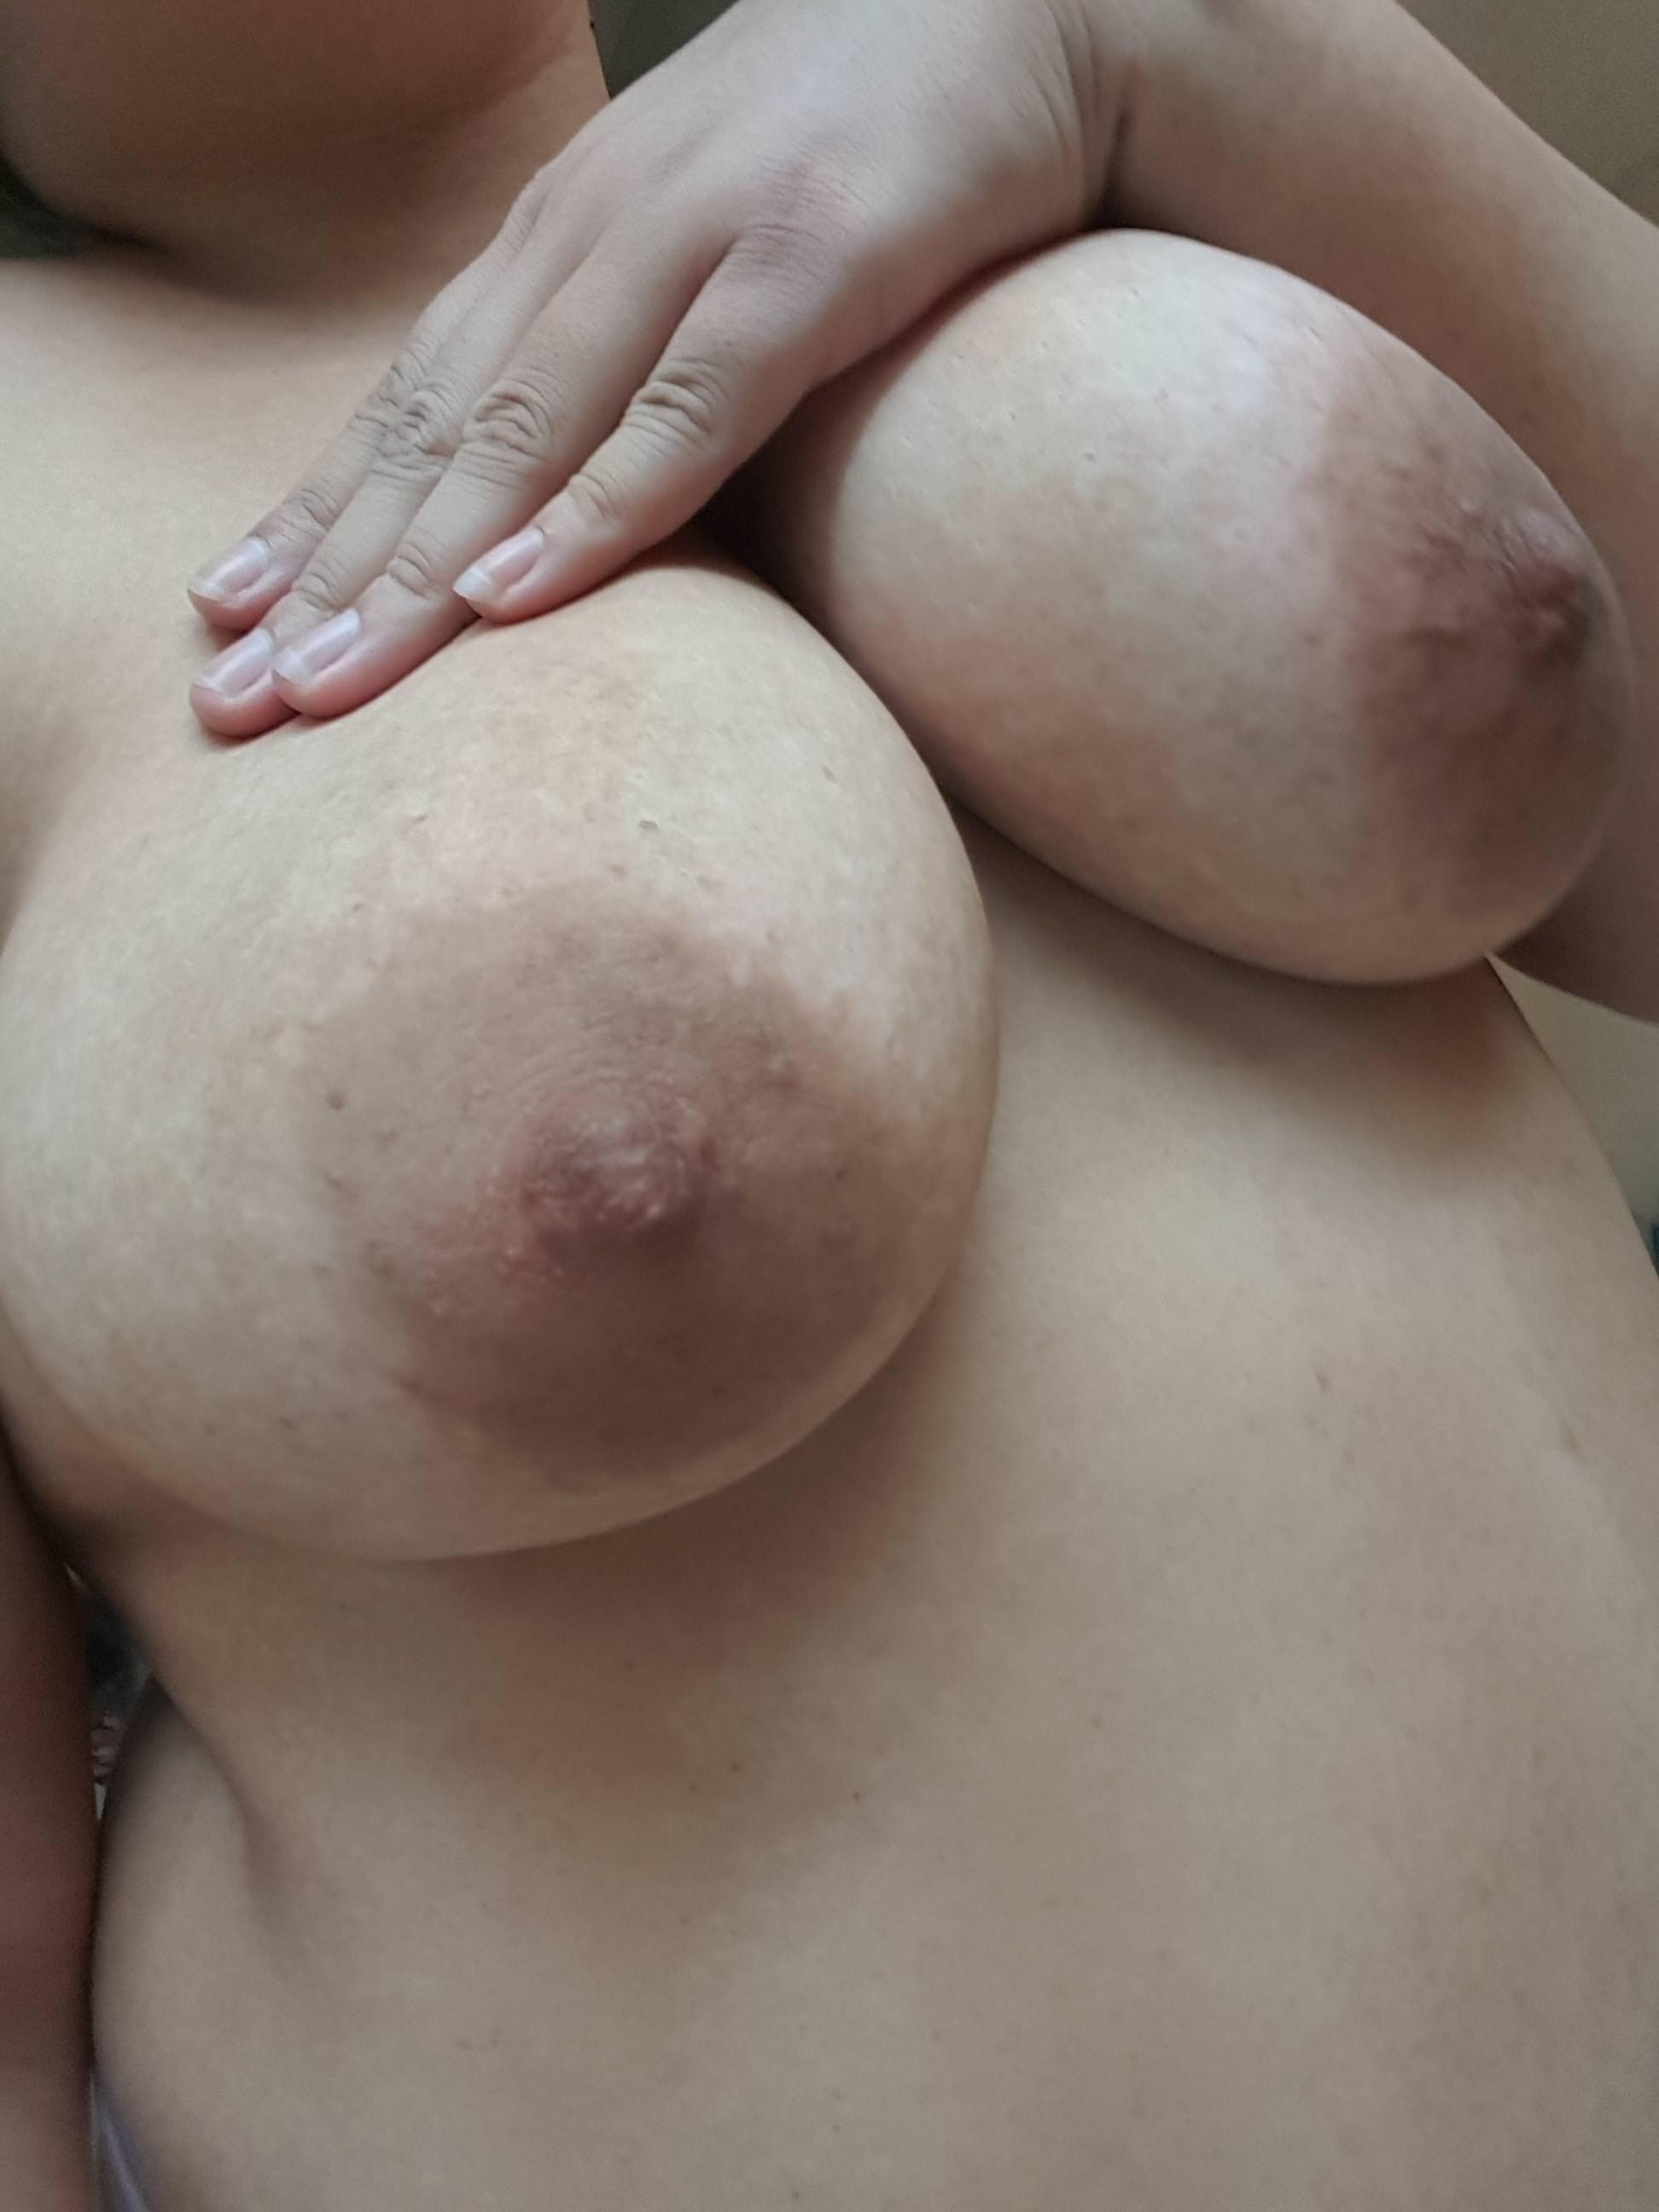 reddit porn in a minute